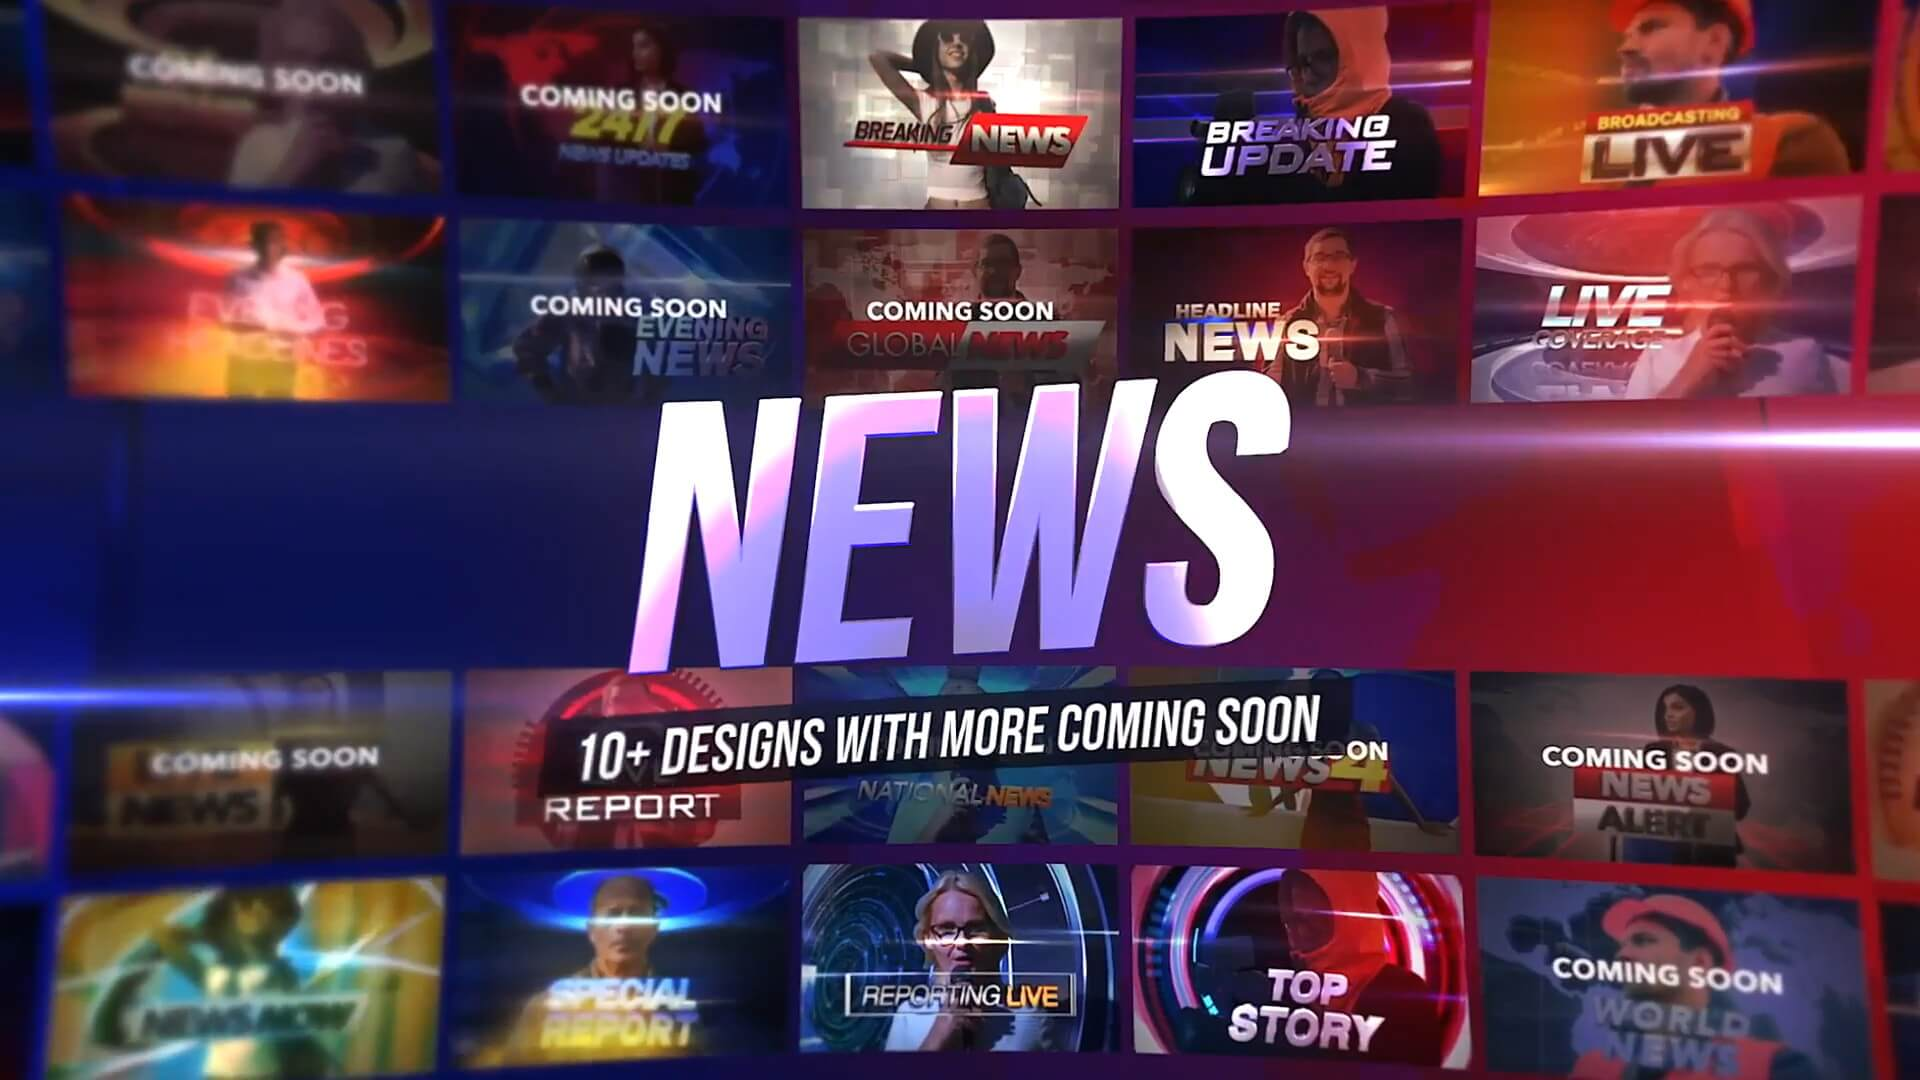 fcpx插件 30组新闻栏目风格定格冻结帧效果制作预设 3D Freeze Frame News